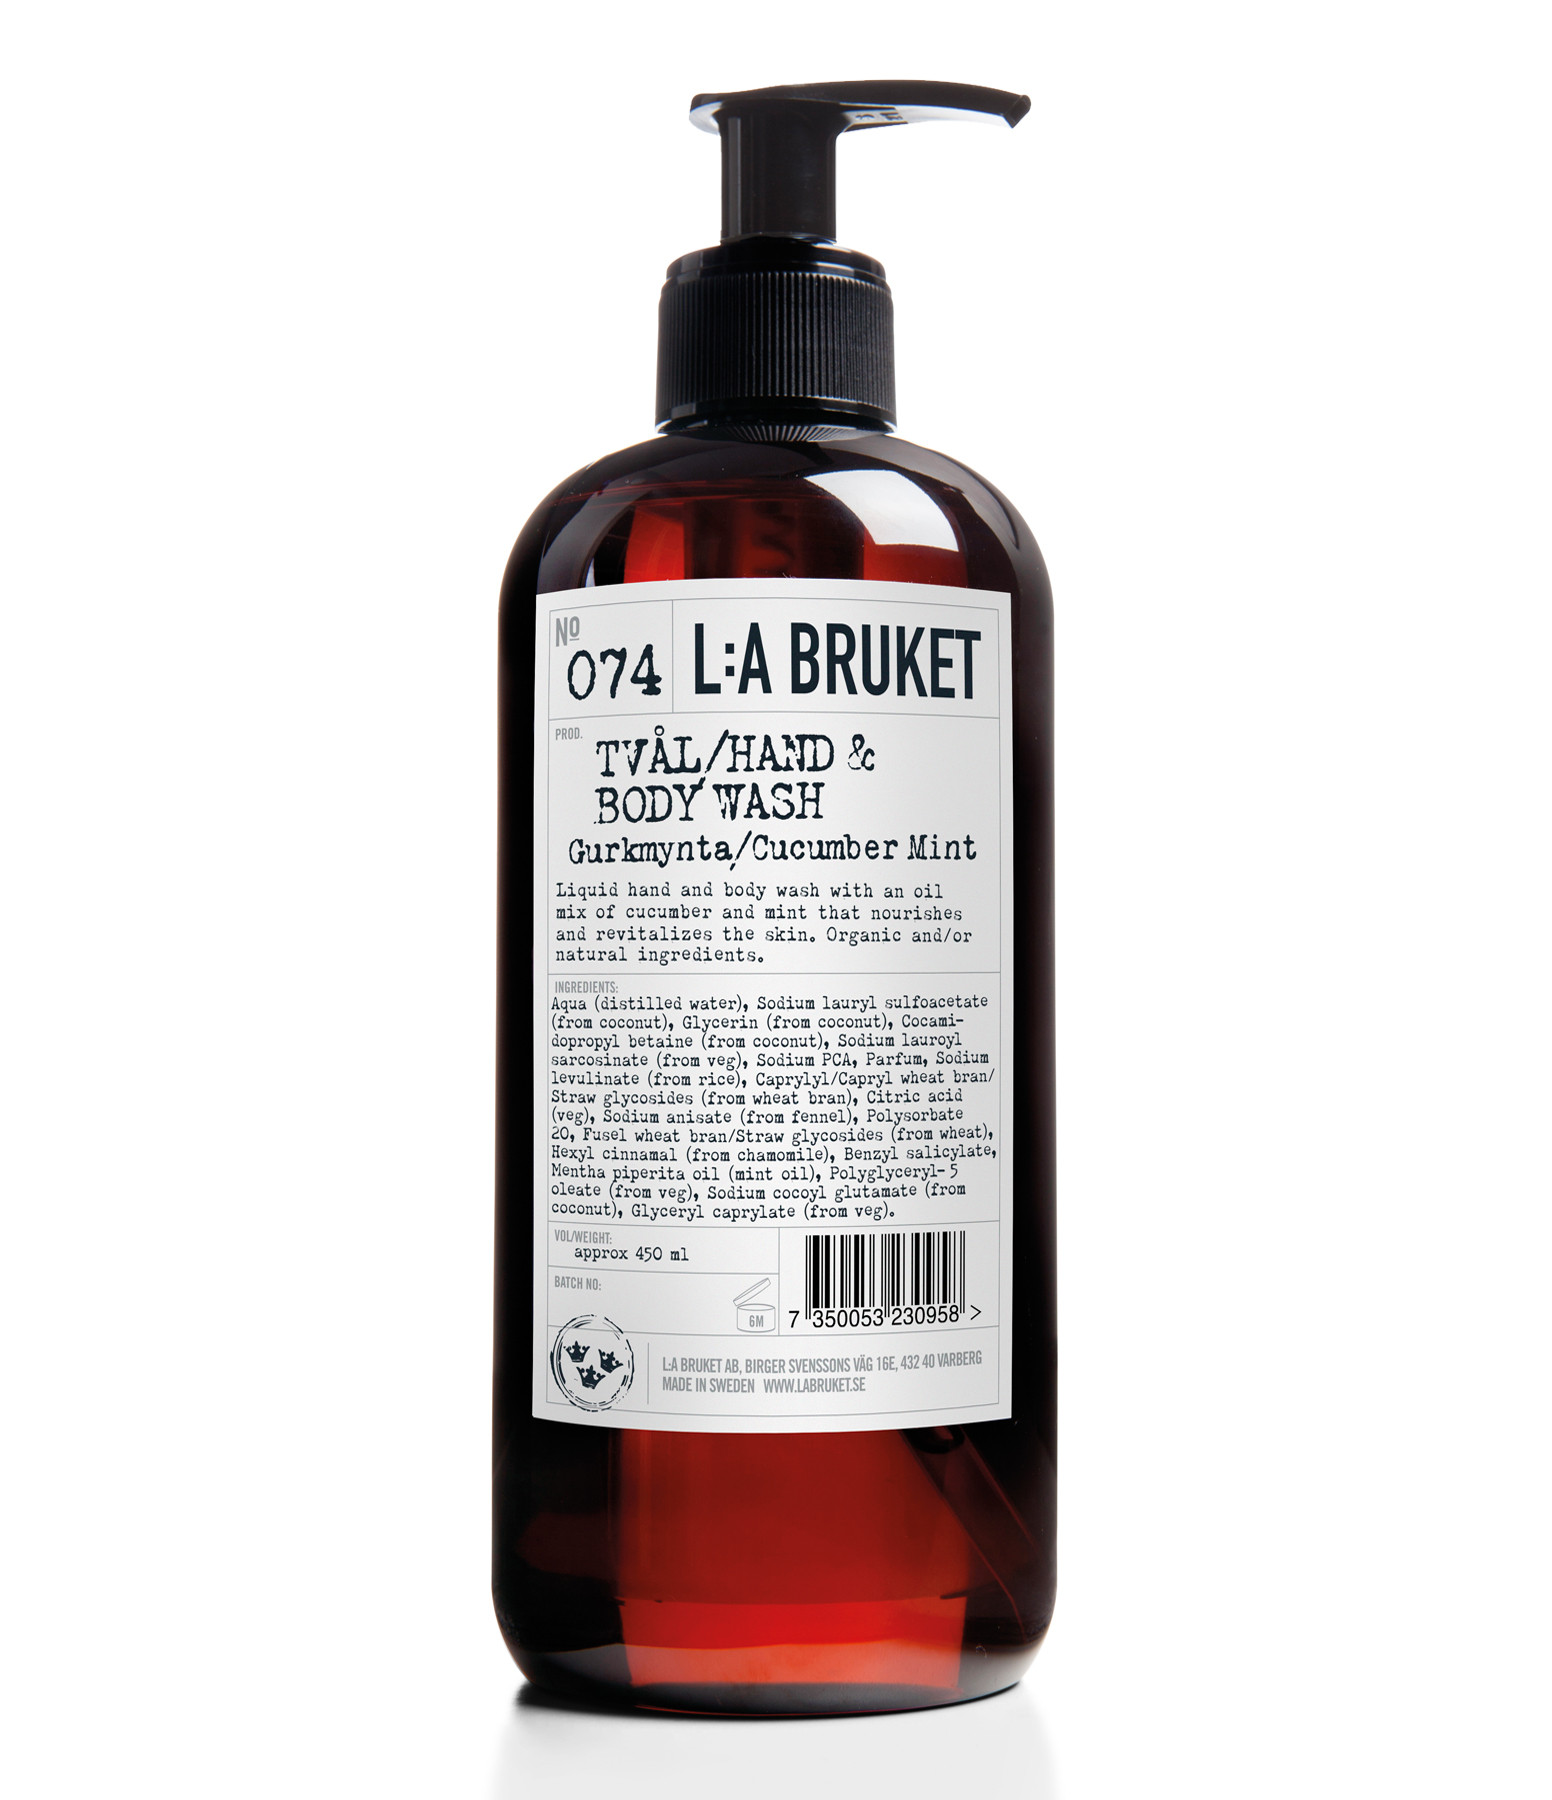 L:A BRUKET - Savon Liquide Concombre Menthe 450ml N°074